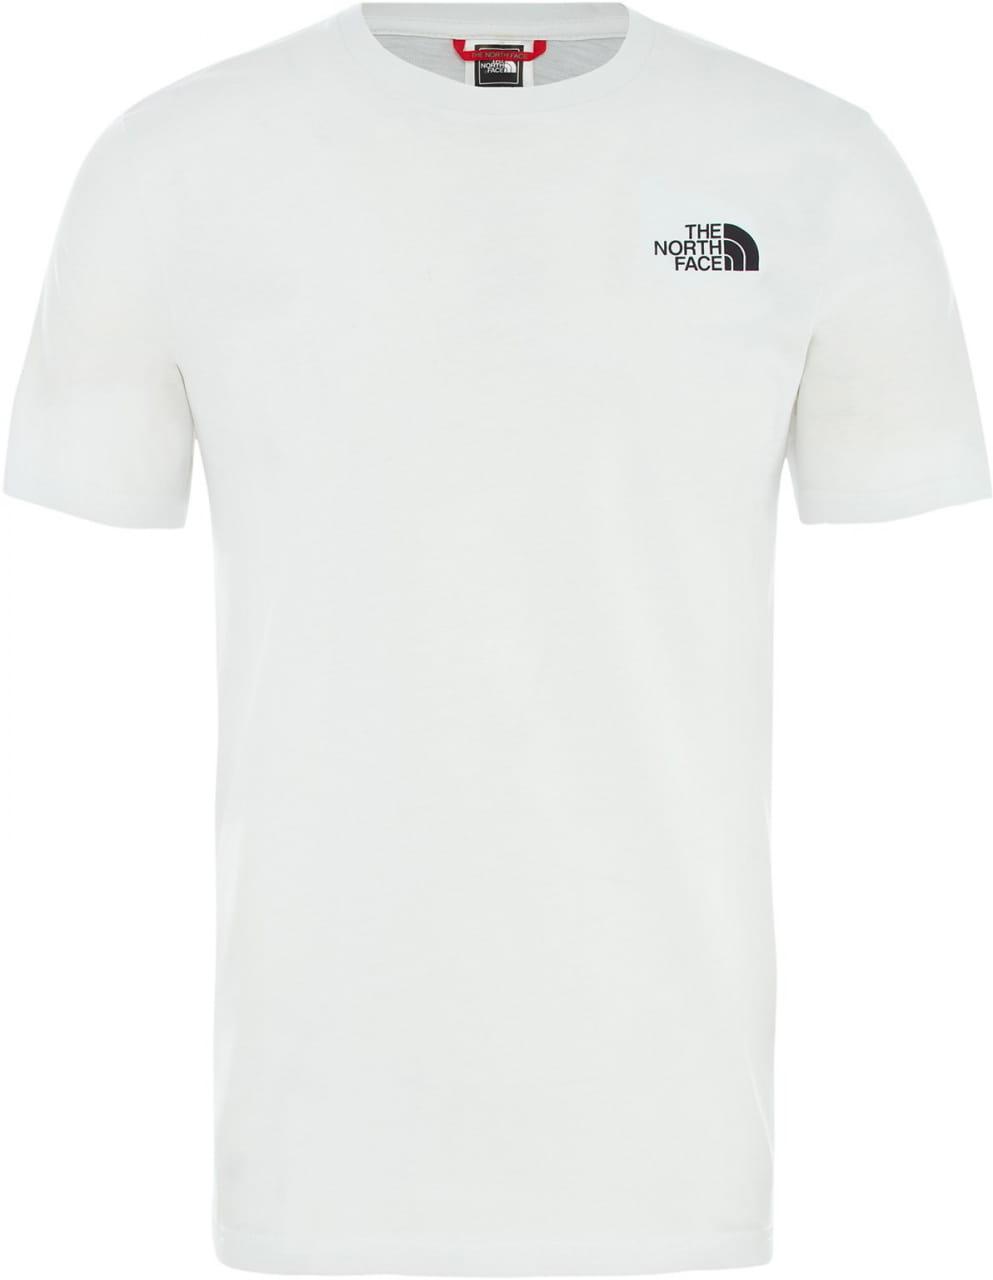 Pánské tričko The North Face Men's Xrx T-Shirt